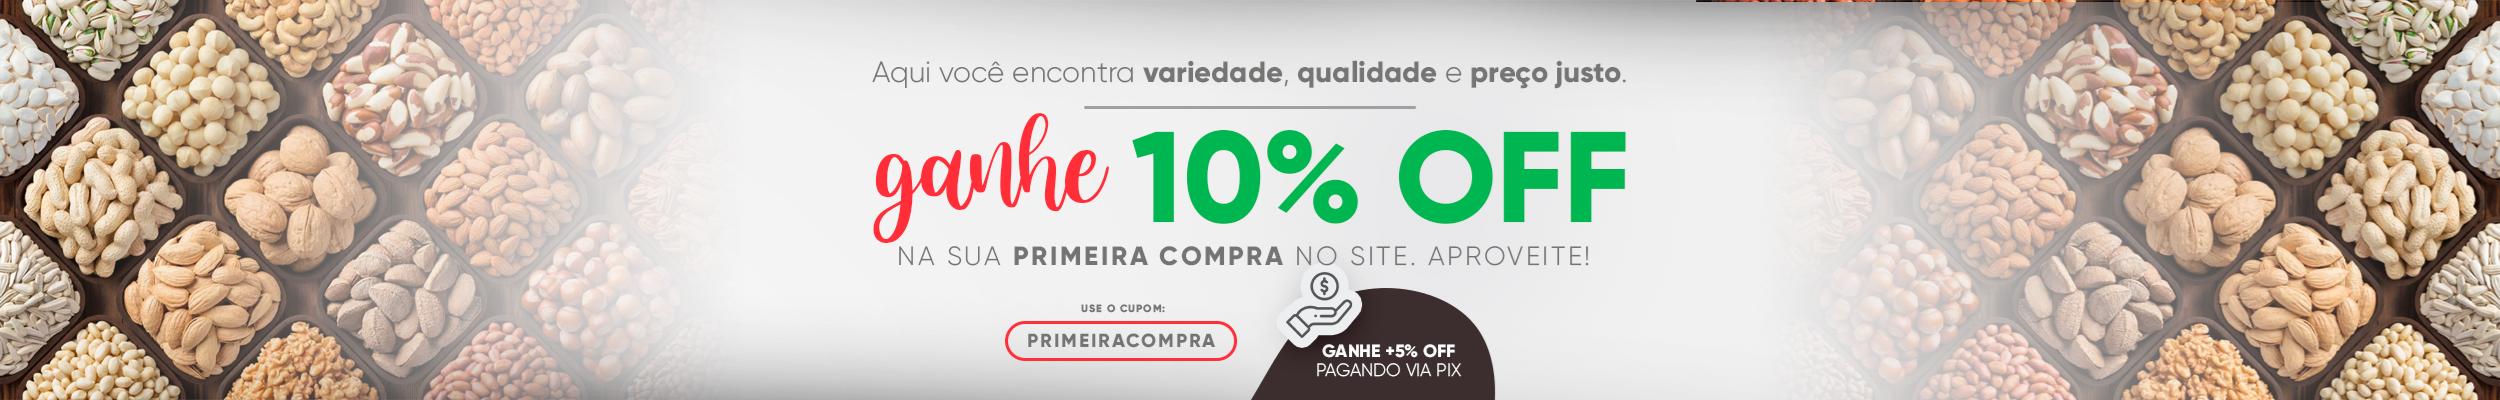 Primeira Compra 10% OFF